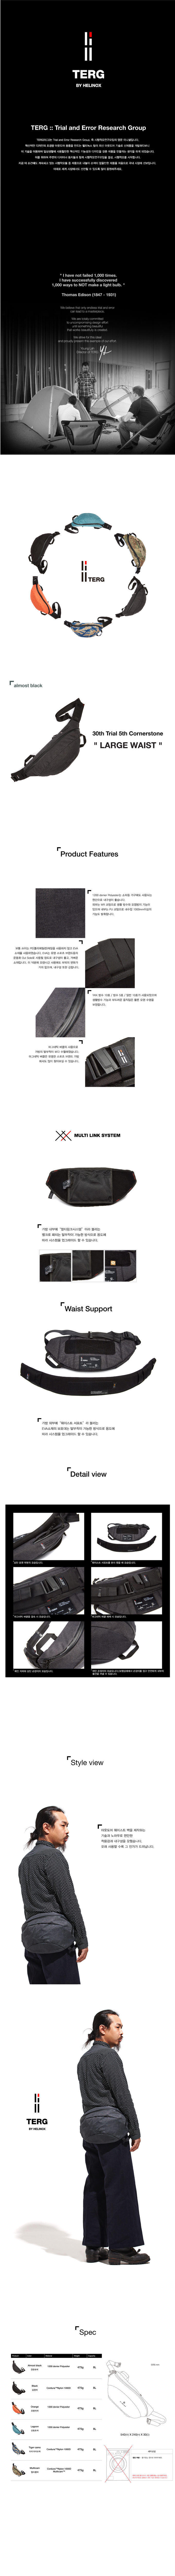 20170807-Large-waist---almost-black.jpg